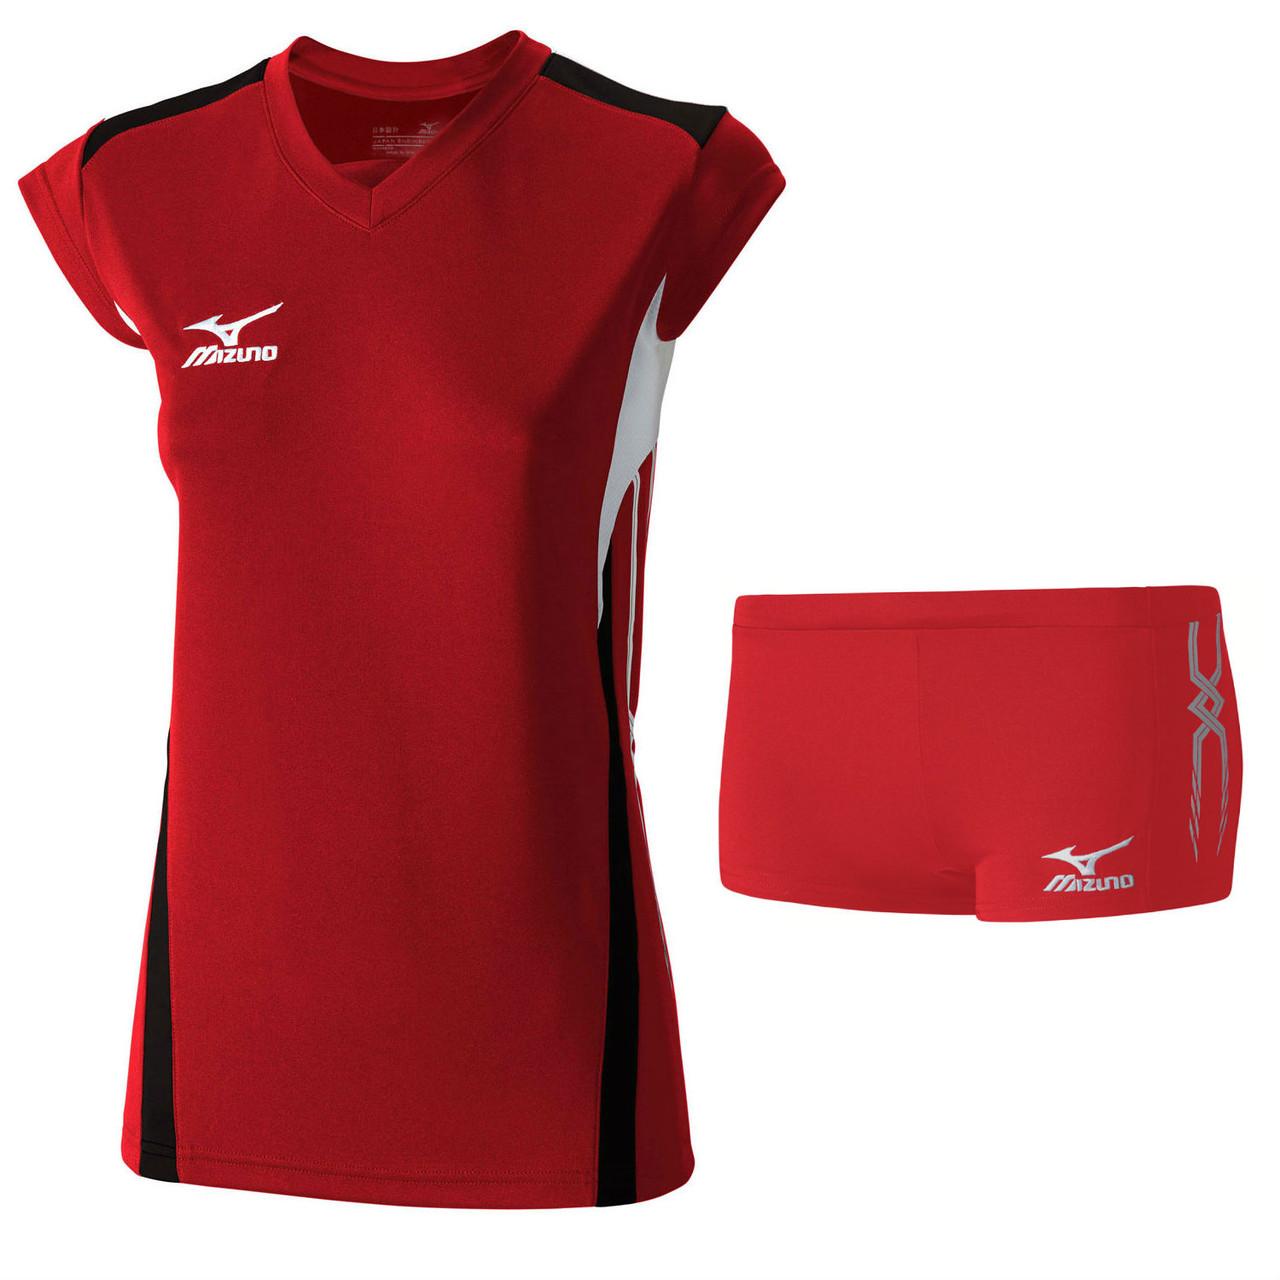 Волейбольная форма Mizuno (футболка W Premium Cap Sleeve V2GA6C20-62+шорты PREMIUM WOMEN'S TIGHTS V2GB6D60-62, фото 1